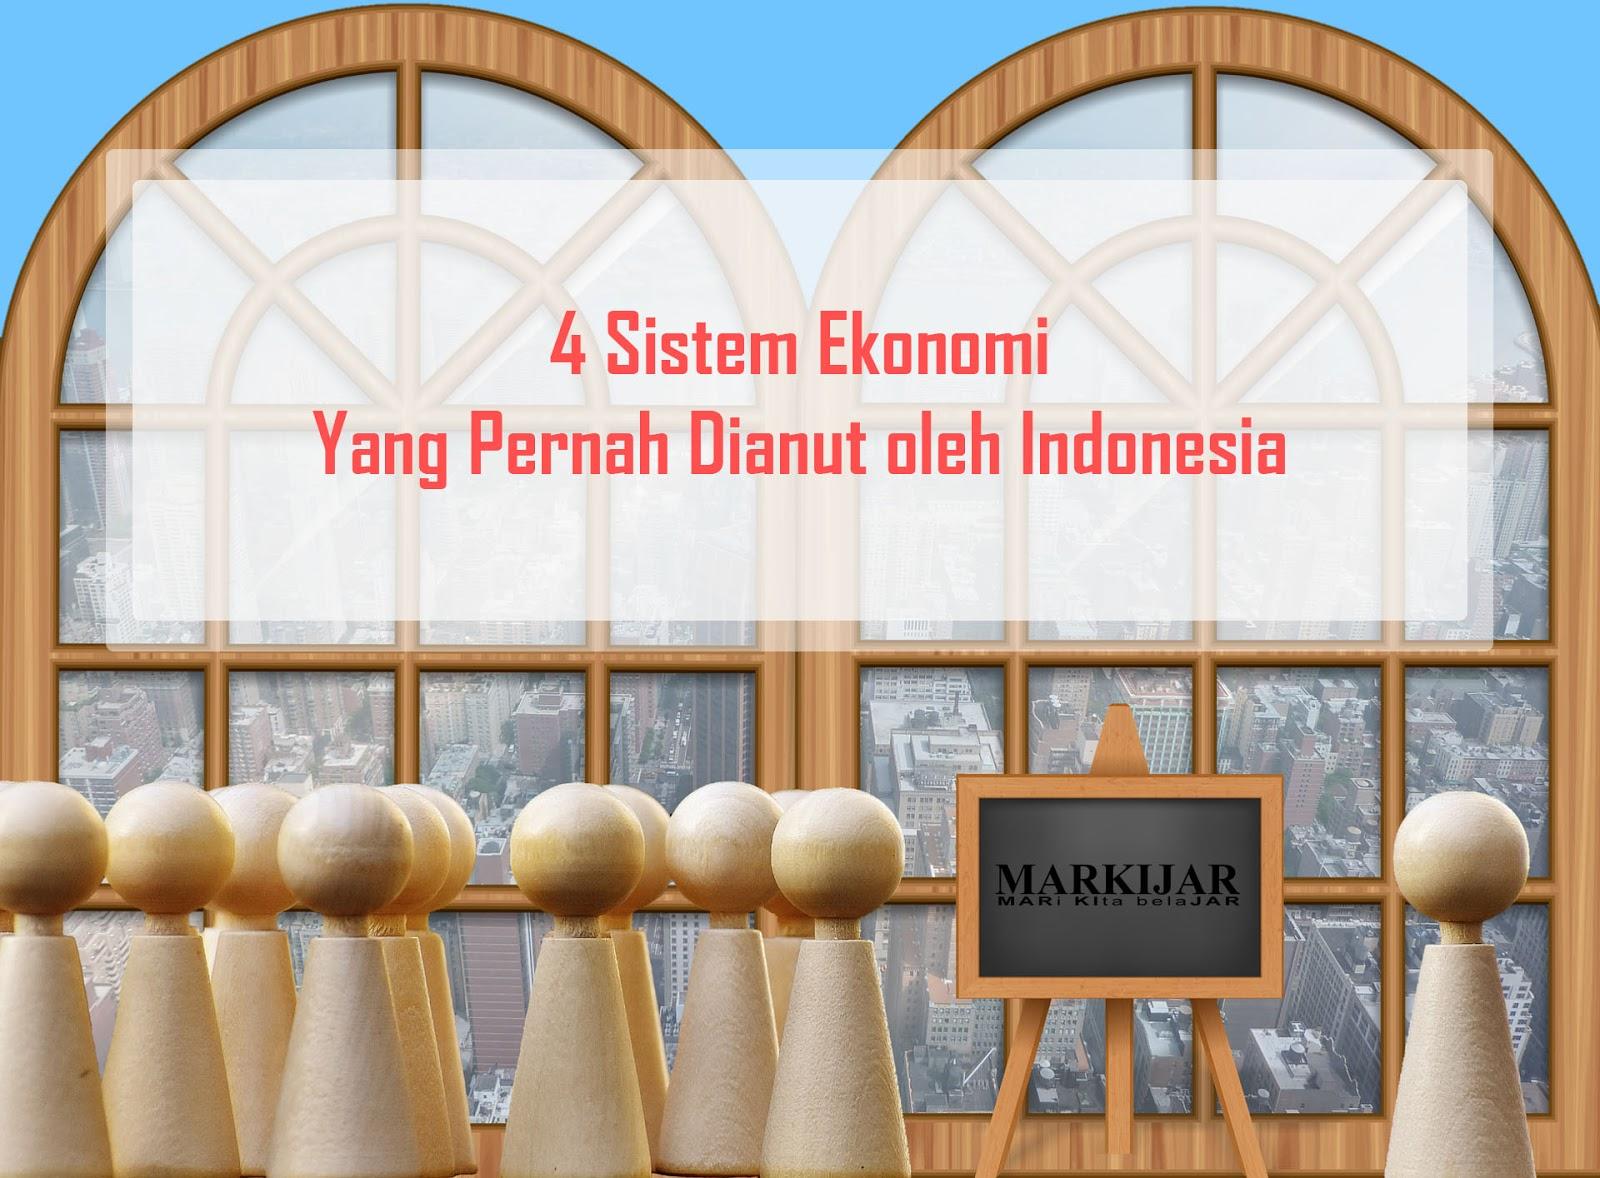 4 sistem ekonomi yang pernah dianut oleh indonesia lengkap 4 sistem ekonomi yang pernah dianut oleh indonesia lengkap pejelasan ccuart Image collections